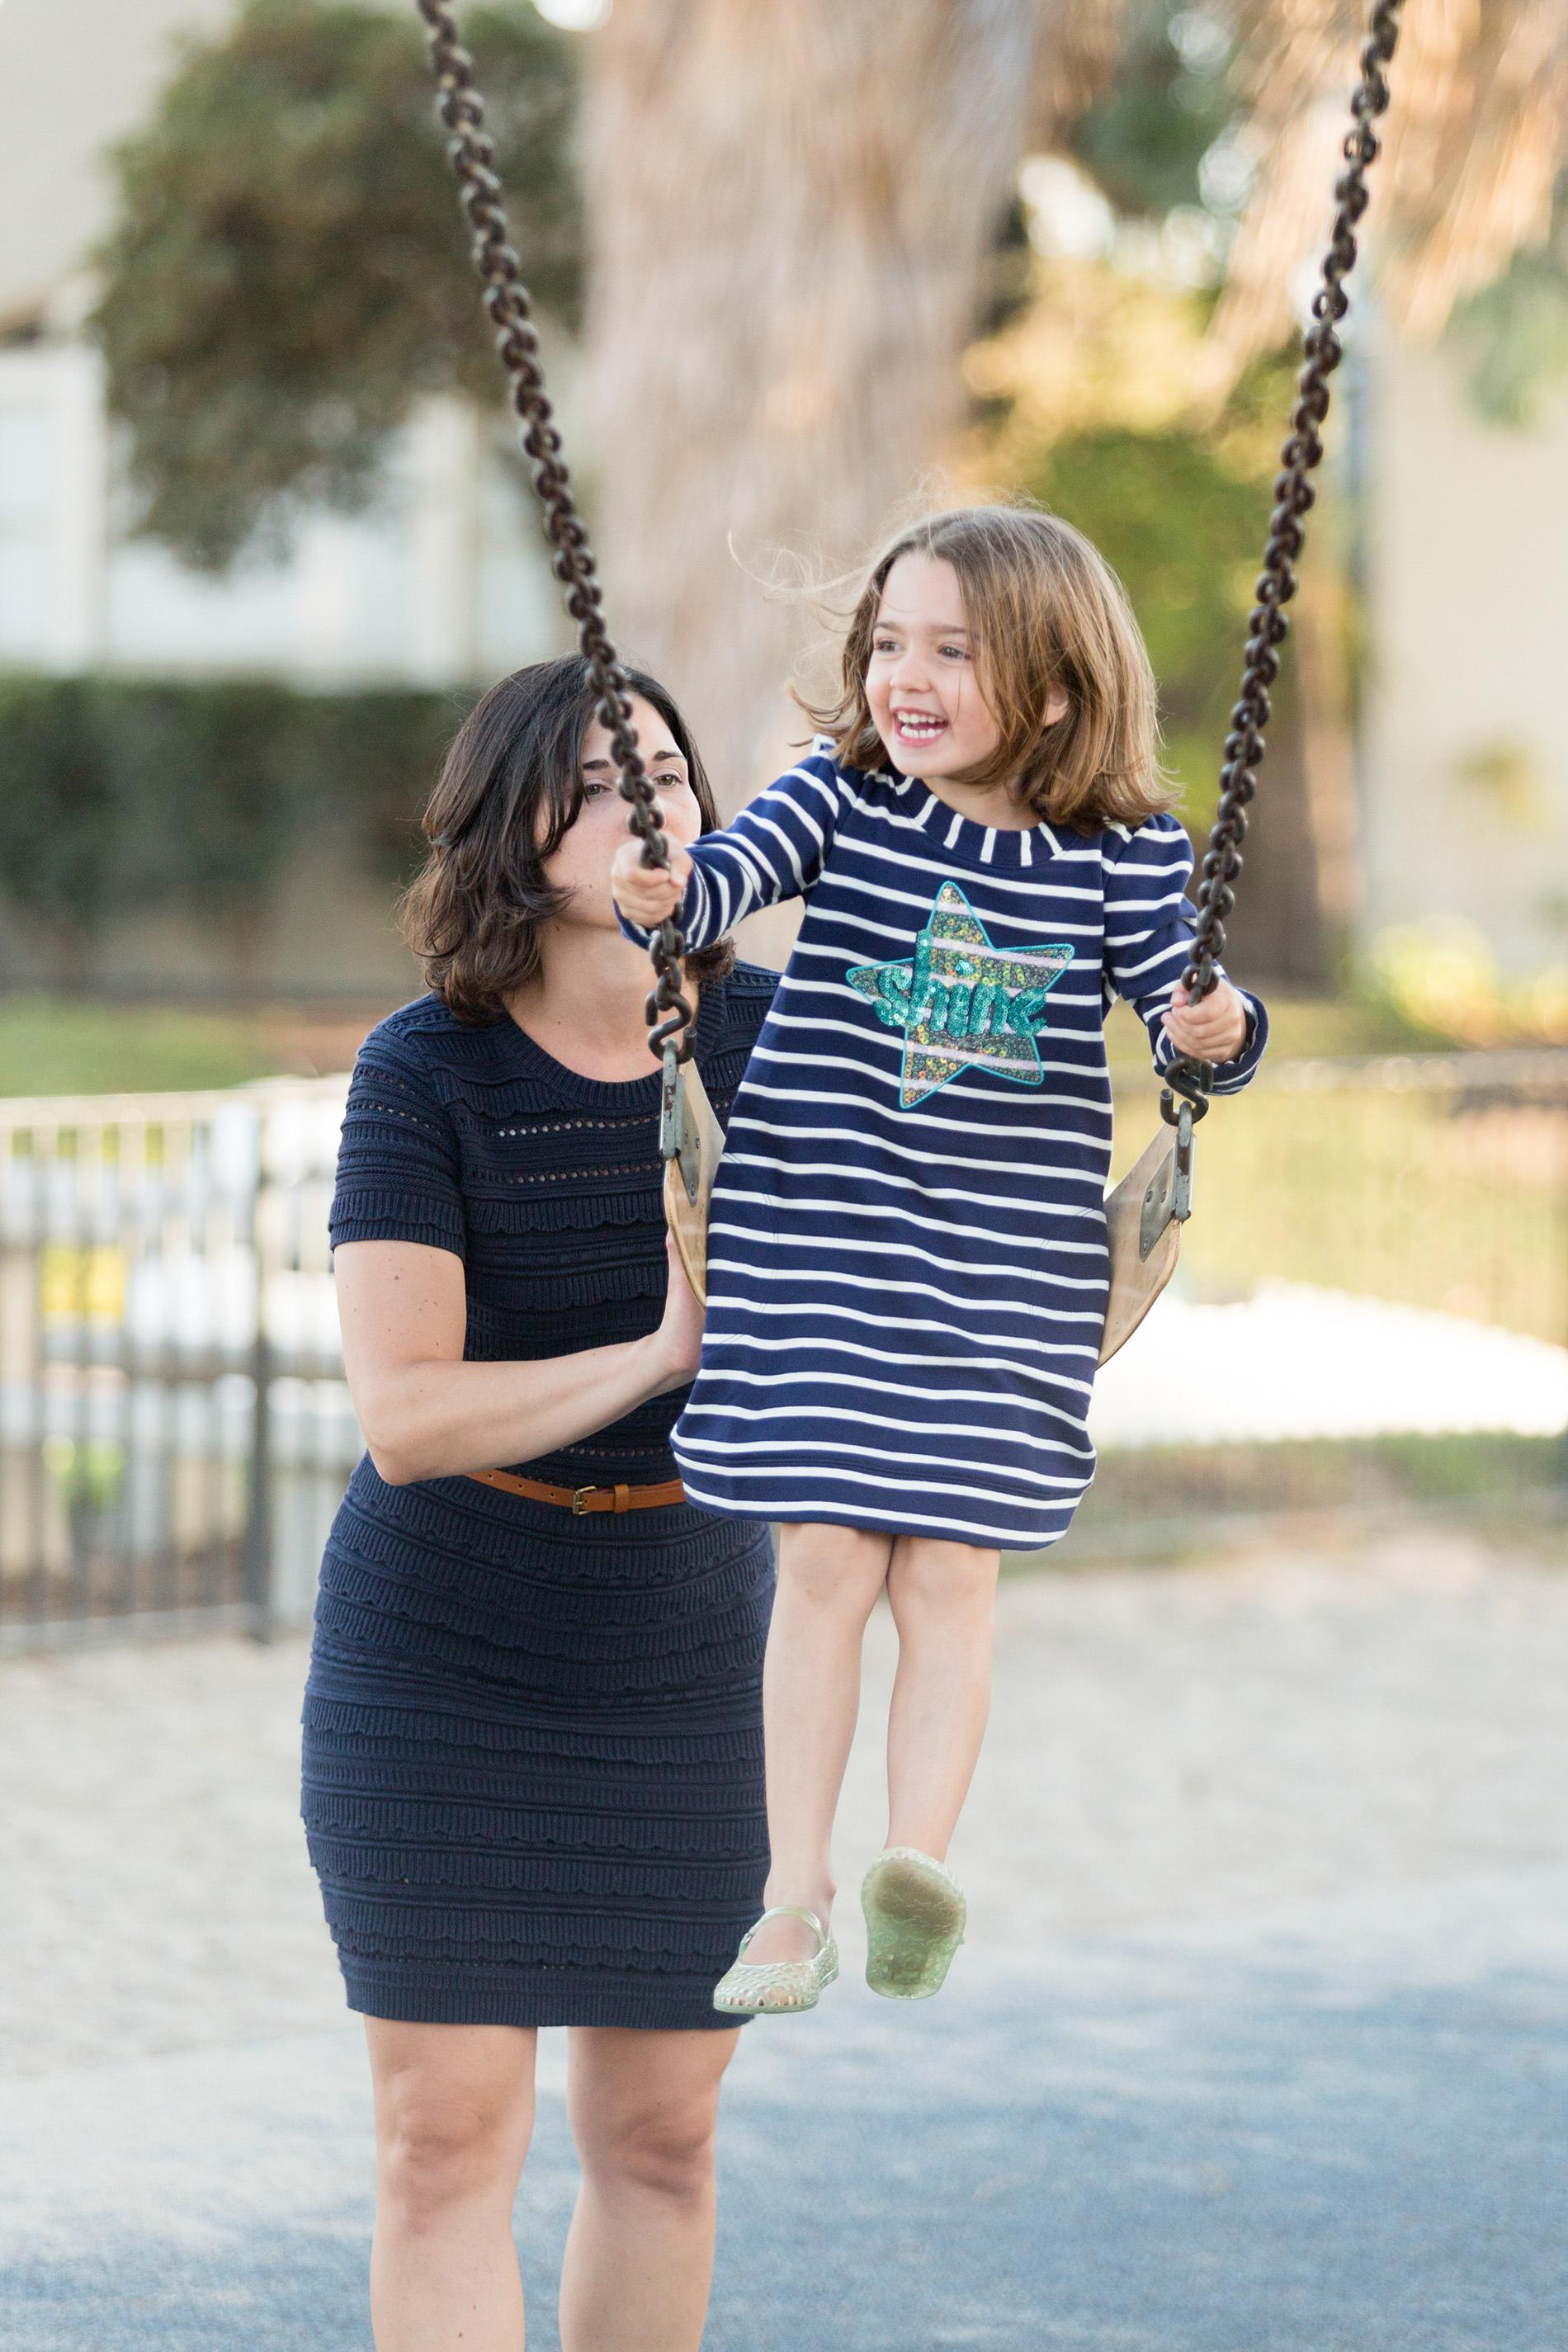 San Diego Lifestyle Family Photographer Christine Dammann Photography Kensington-7.jpg